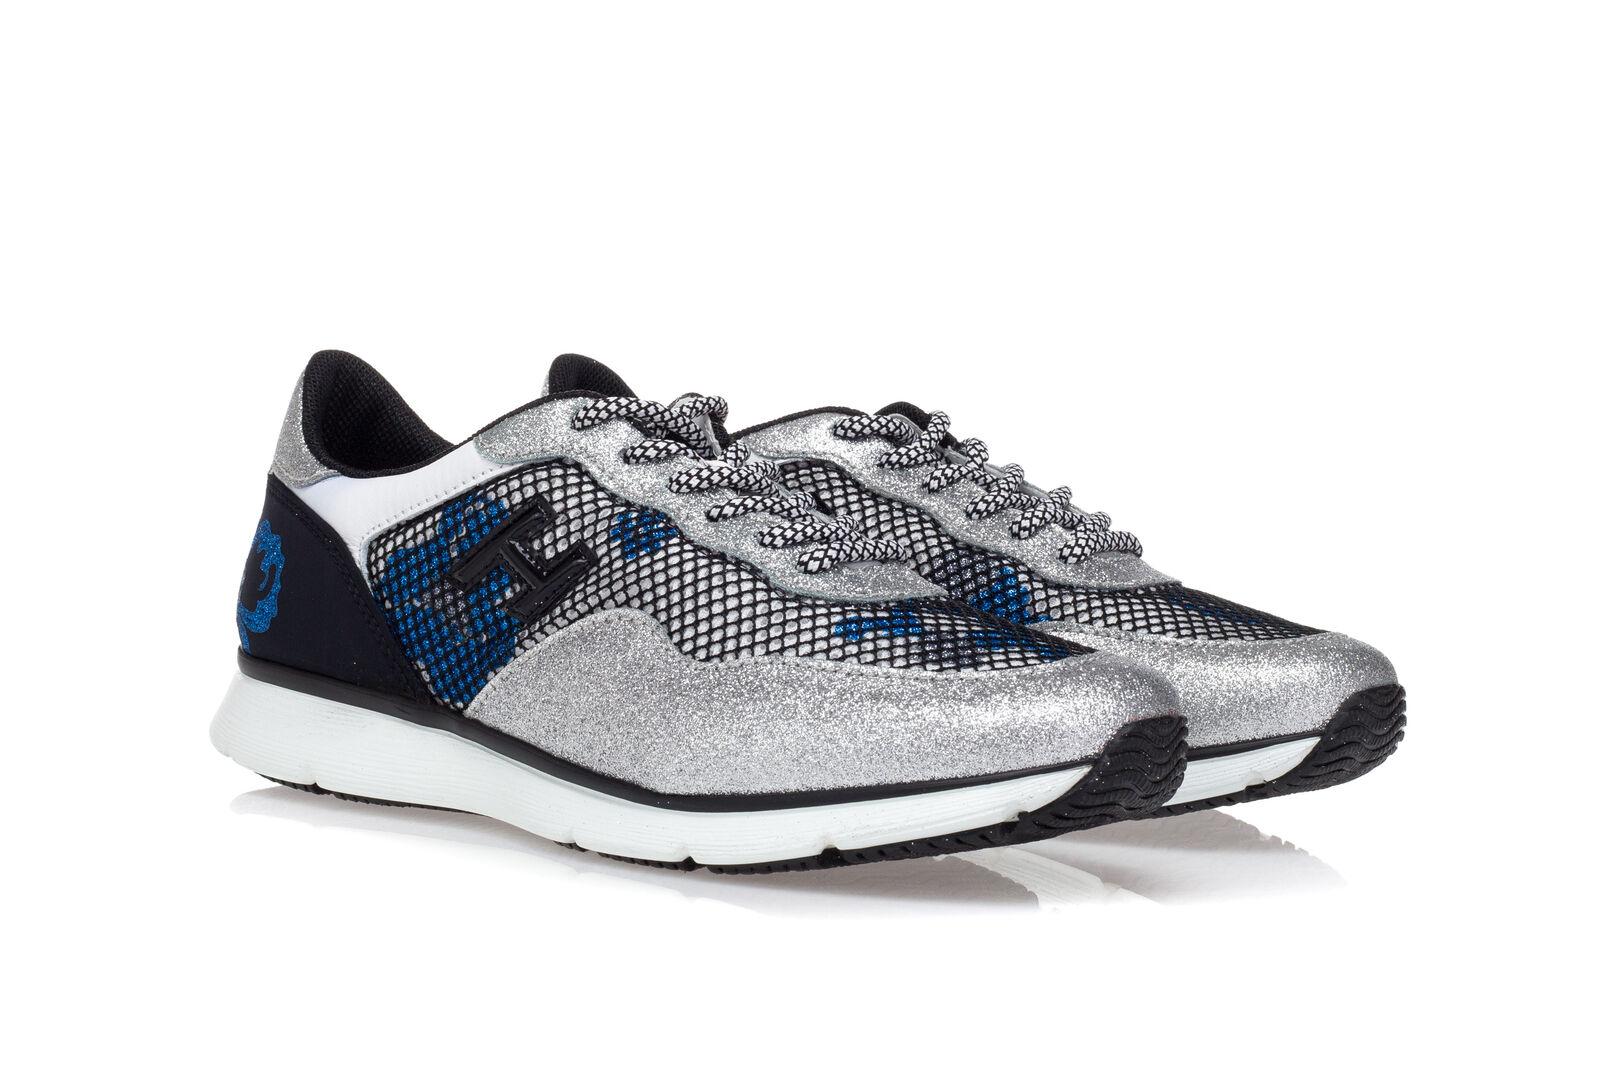 f7672438d4033 hogan scarpe sneakers donna h254 glitter argento pelle bianca camoscio nero  mesh